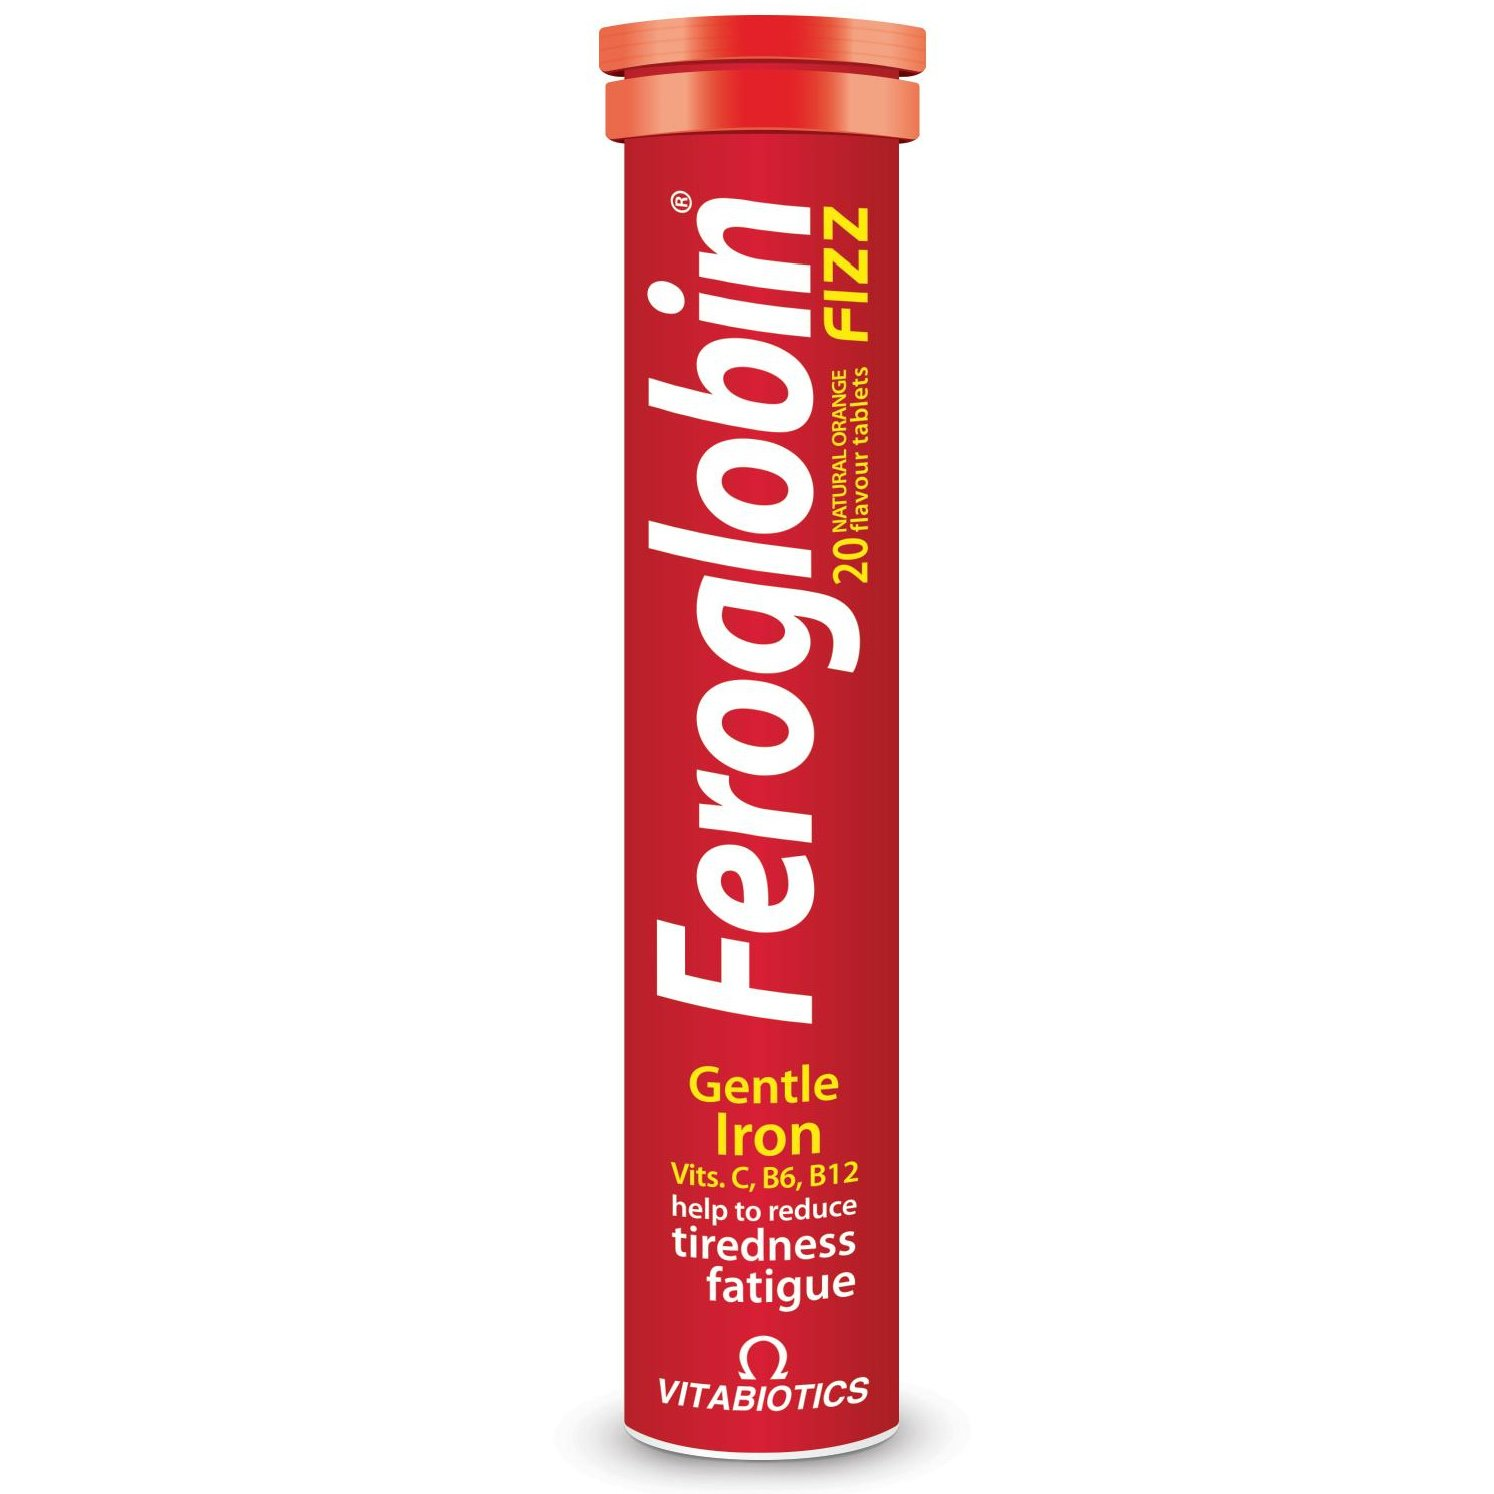 Vitabiotics Feroglobin Fizz Συμπλήρωμα Διατροφής Σιδήρου & Φυλλικού Οξέως σε Αναβράζουσα Μορφή 20effer.tabs